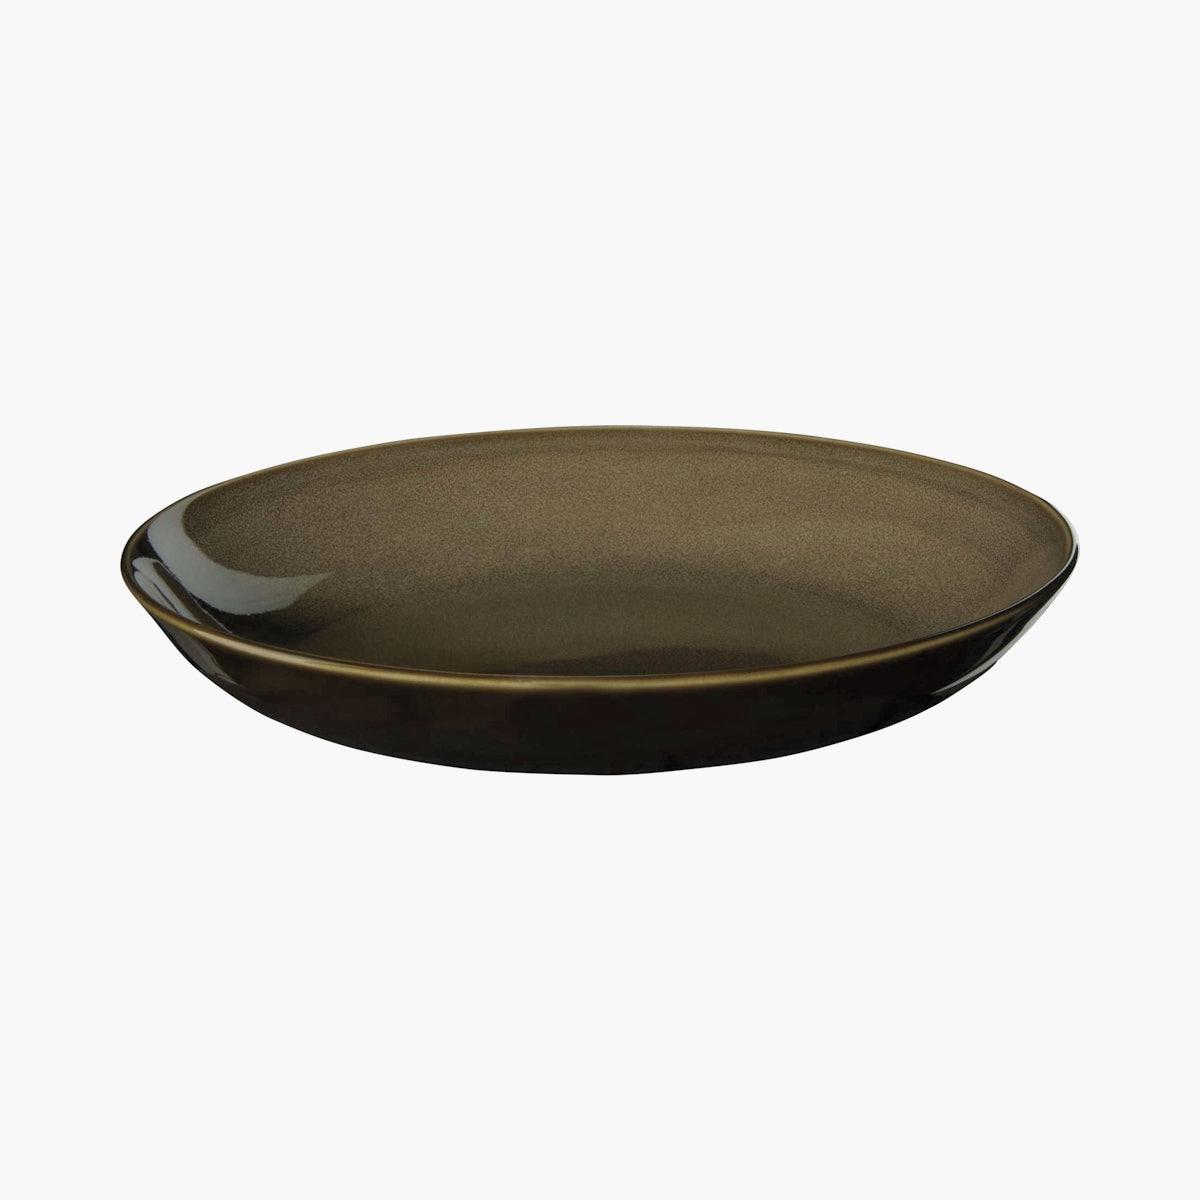 Kolibri Coupe Gourmet Plate